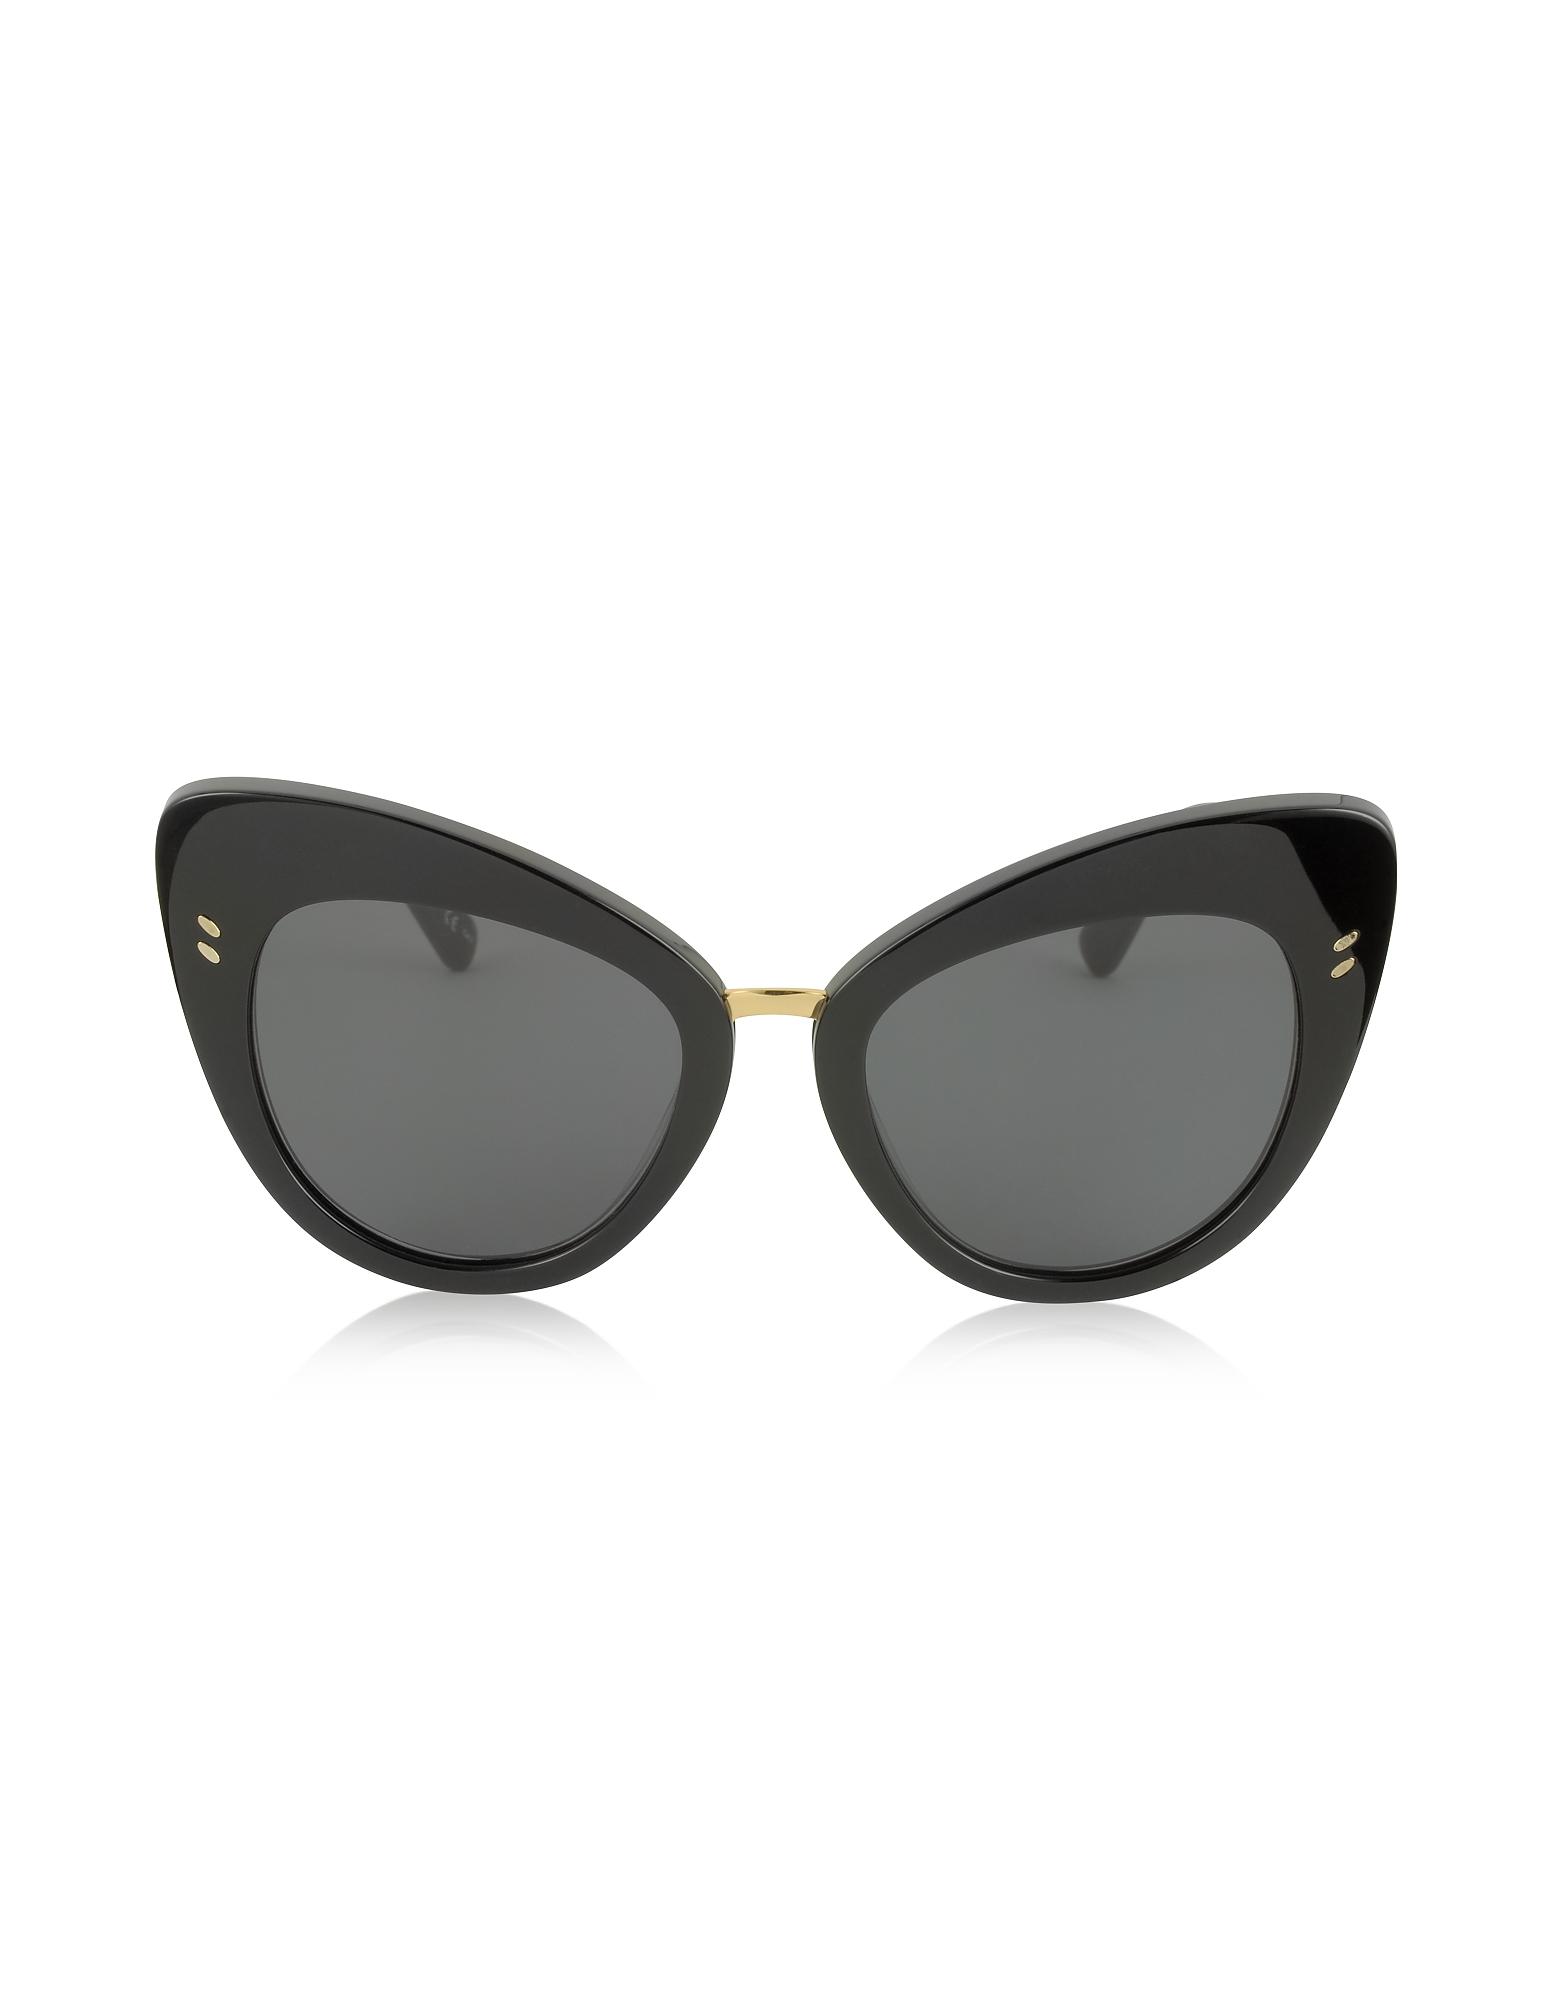 Stella McCartney Sunglasses, SC0037S Acetate Cat Eye Women's Sunglasses